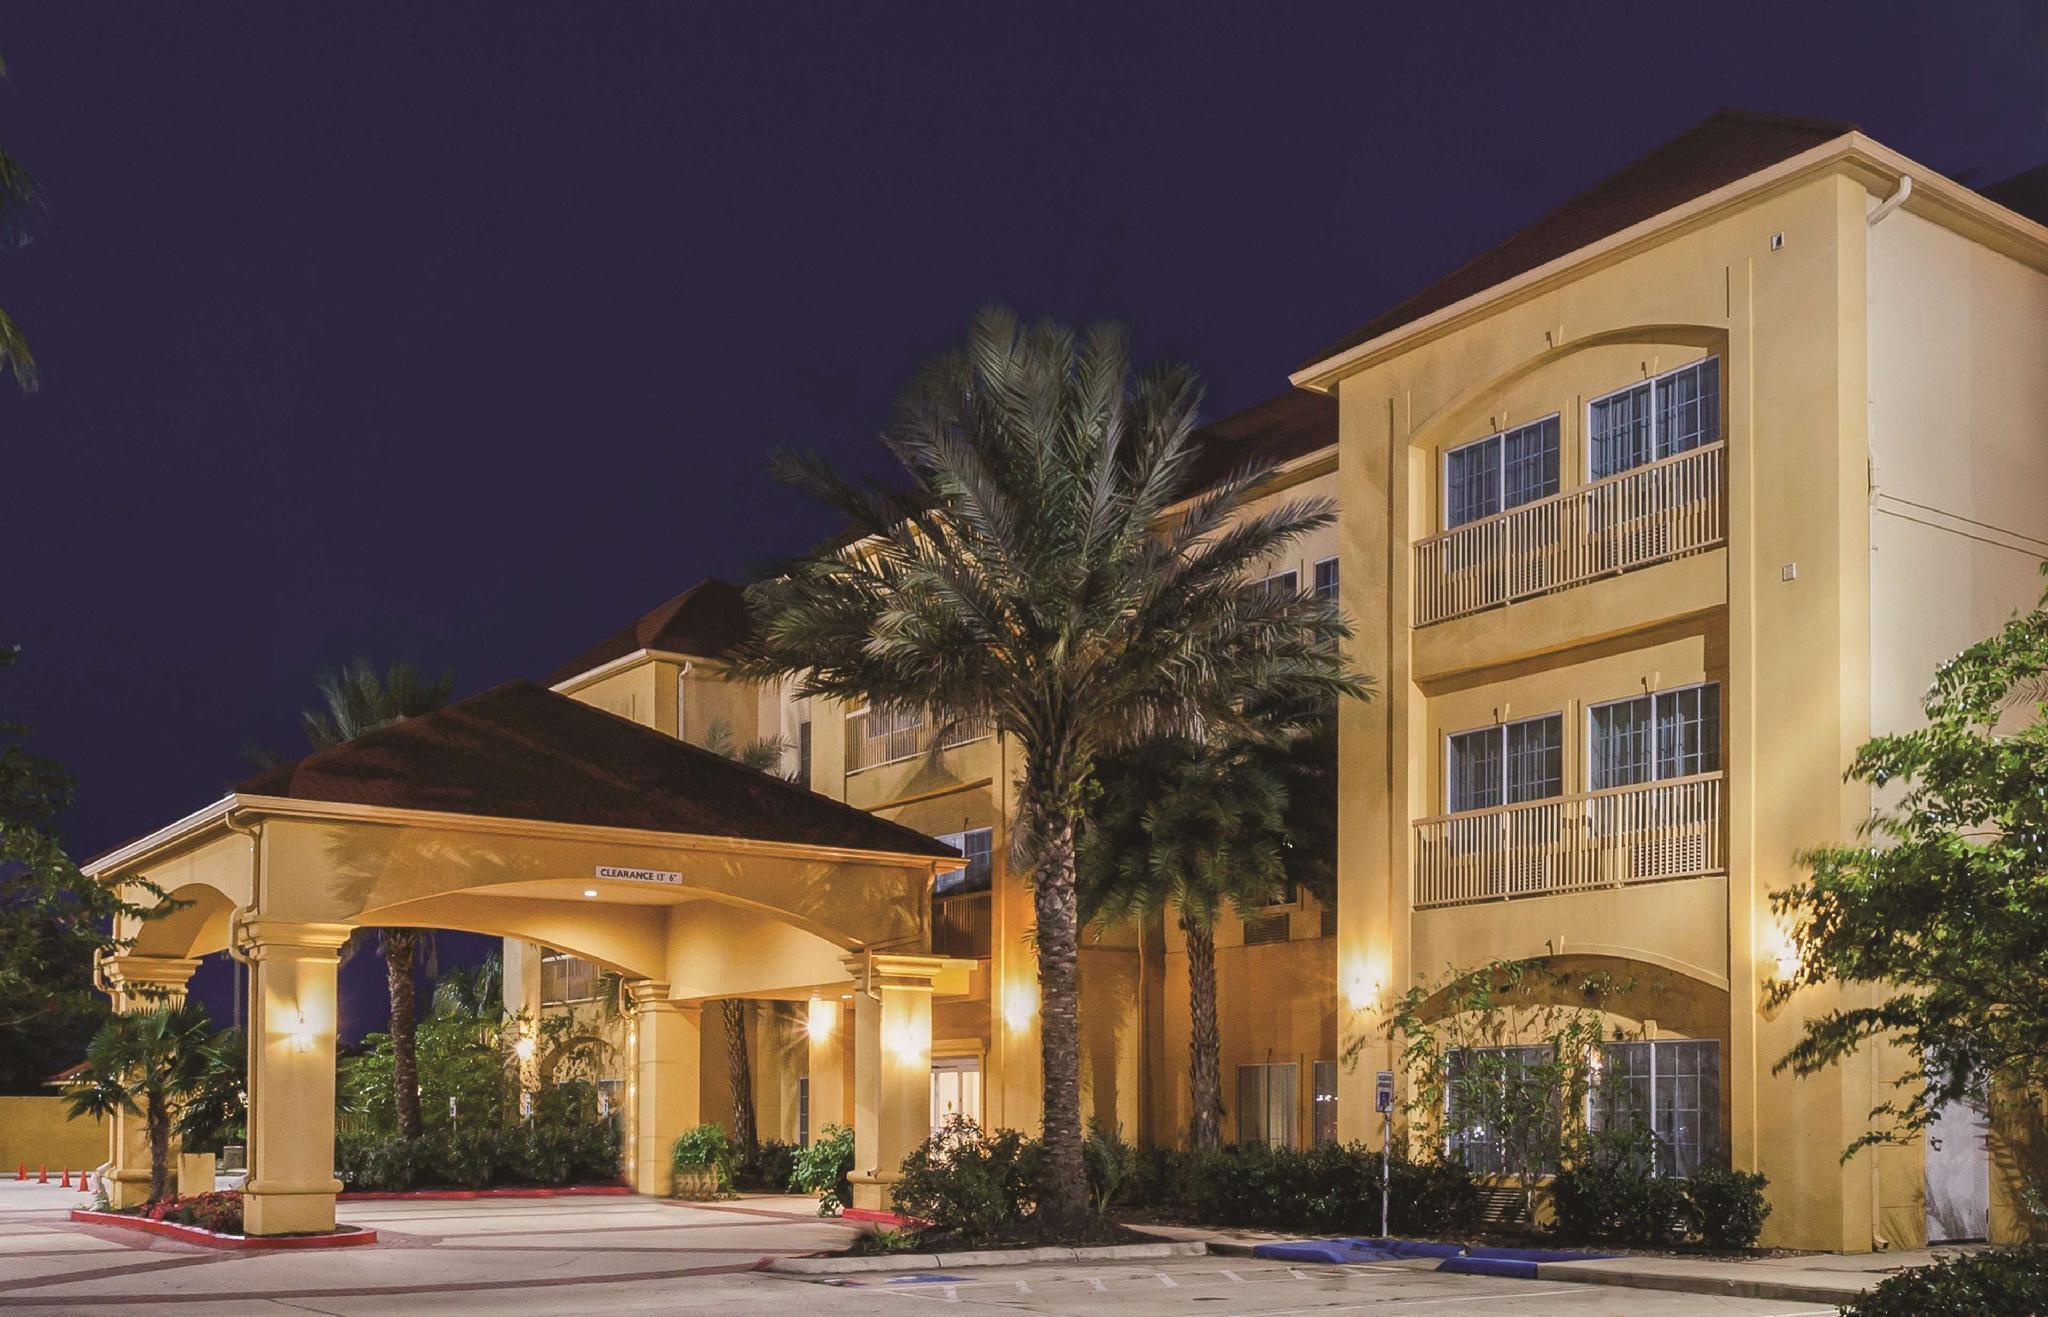 La Quinta Inn And Suites By Wyndham Winnie